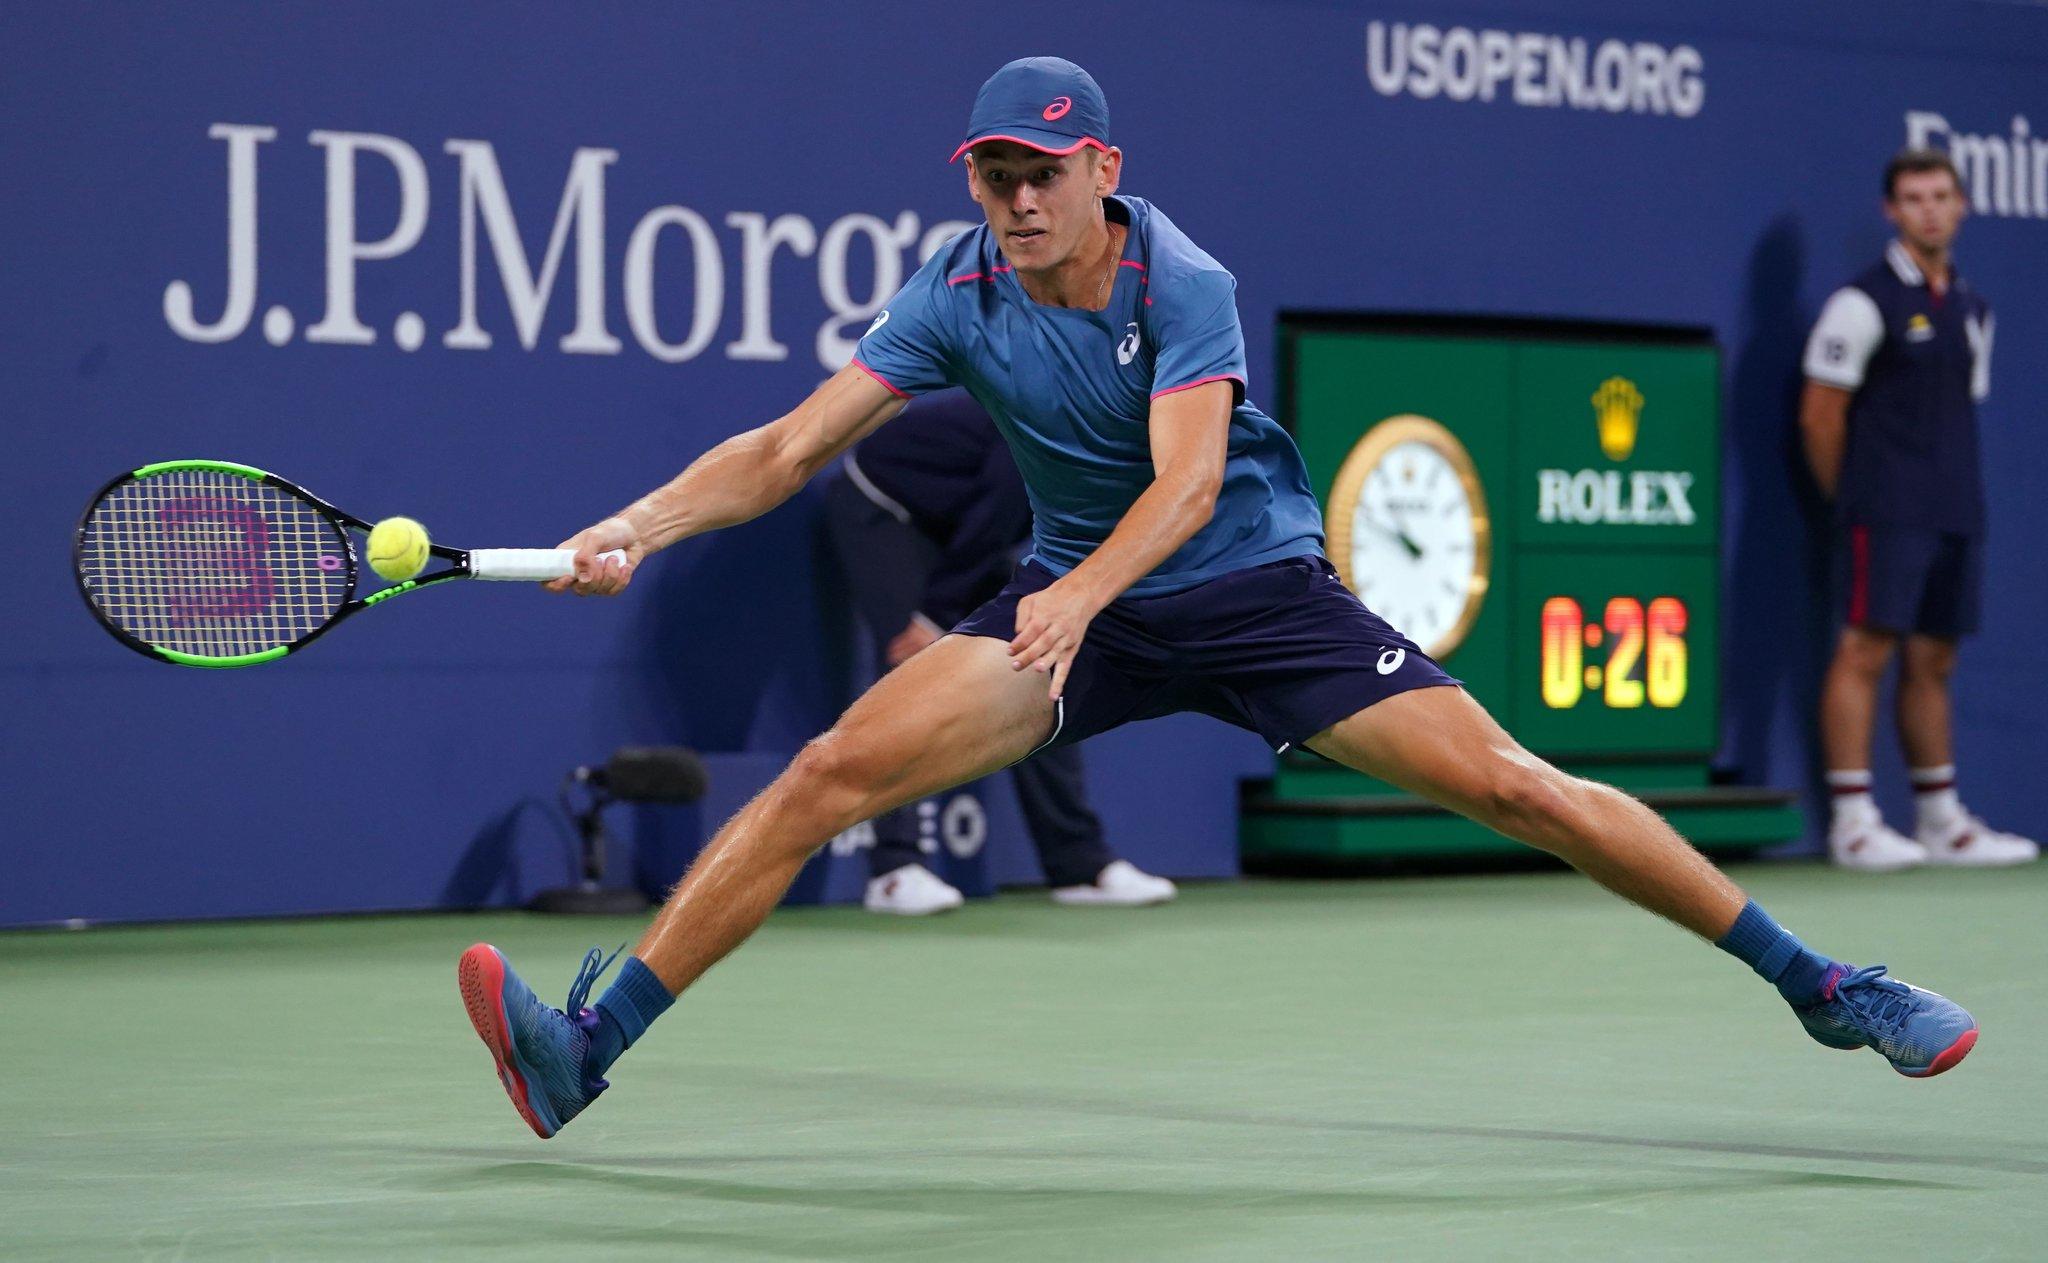 Toronto Open 2021: Alex de Minaur vs Nikoloz Basilashvili Tennis Pick and Prediction